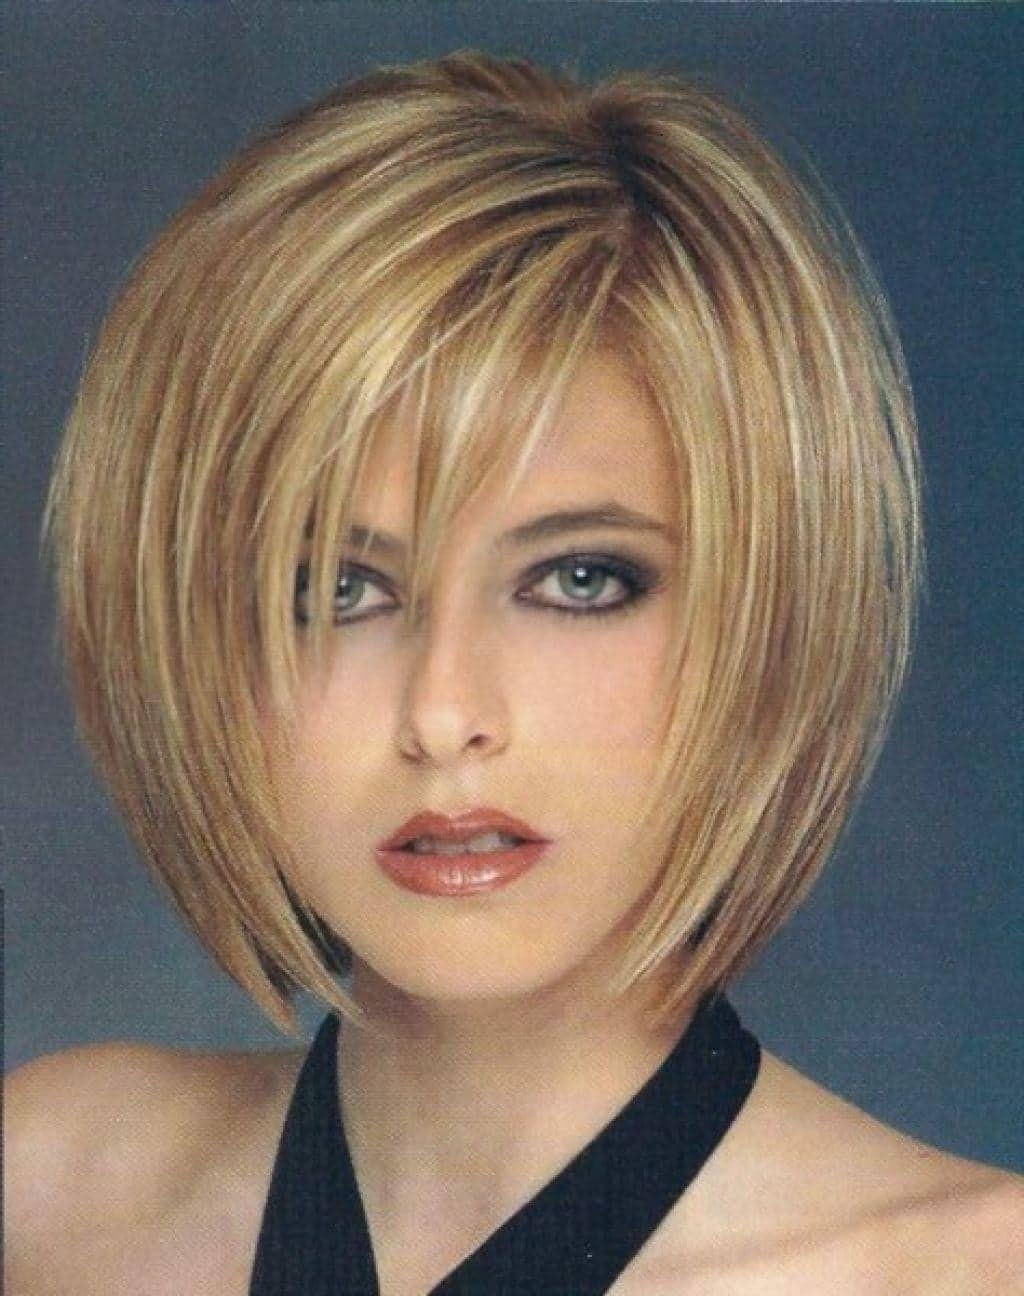 Bob Cut For Thin Hair  Short bob haircuts for thin hair Short and Cuts Hairstyles